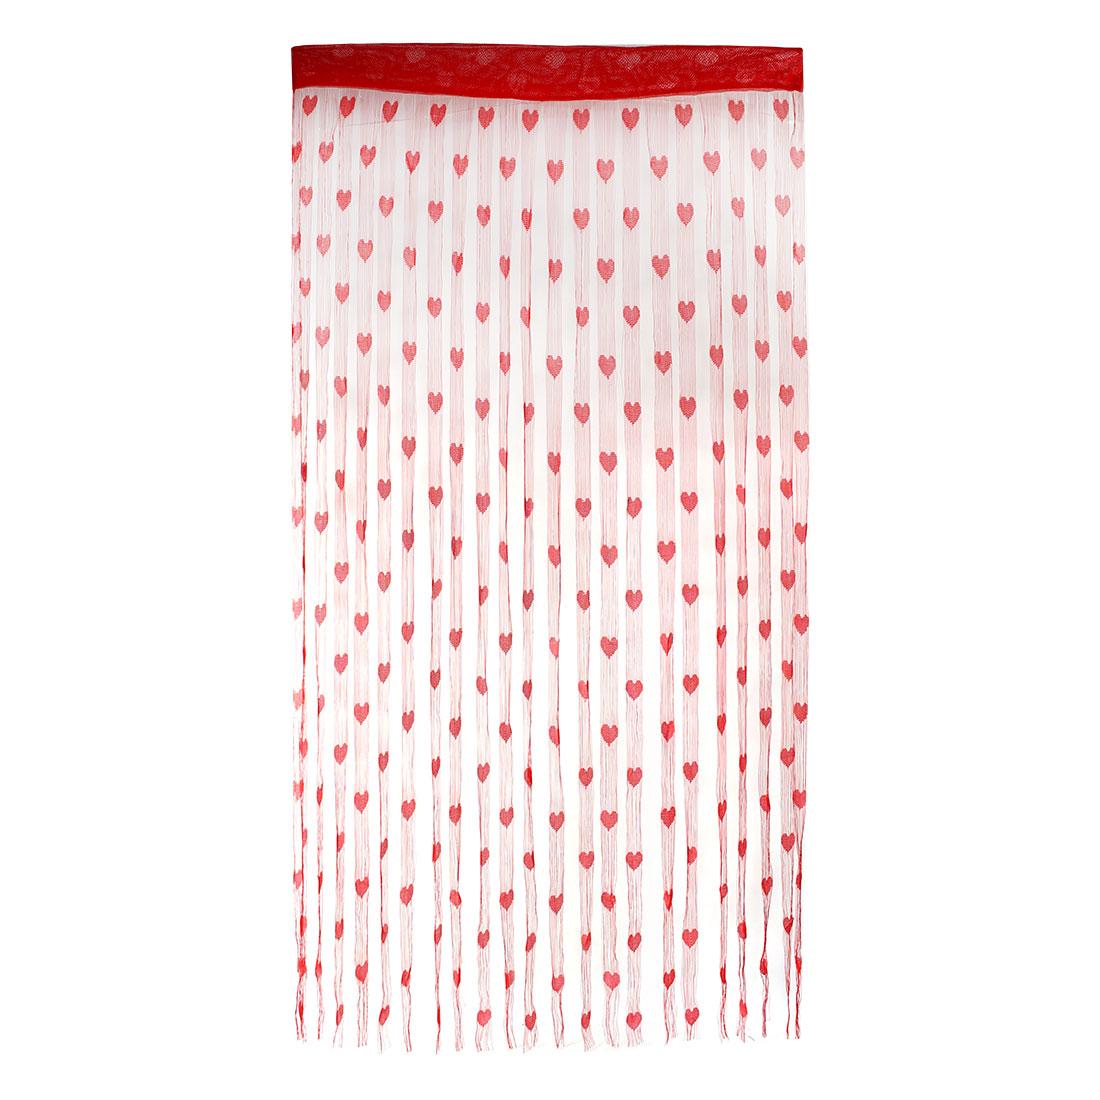 Household Nylon Heart 1 x 2mLine Pattern Divider Tassel String Door Window Curtain Dark Red